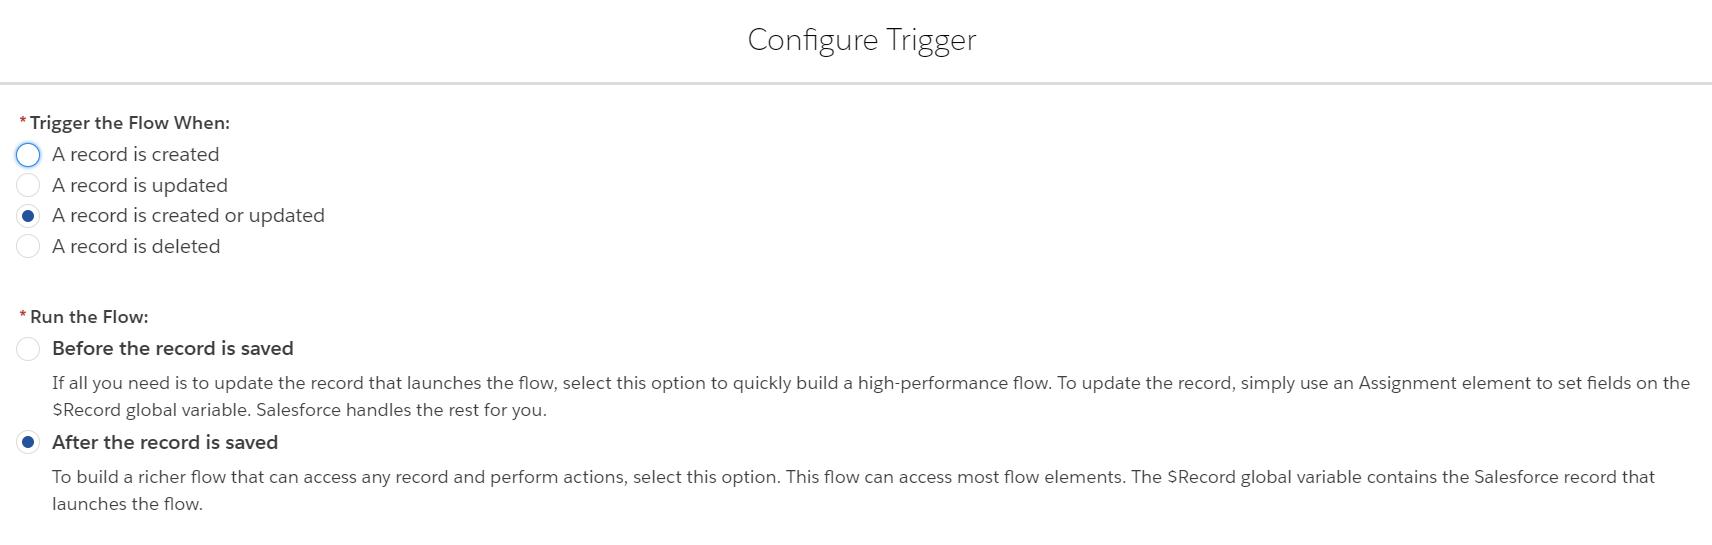 UpdateContactLastEventDate-AfterEventSave-ConfigureTrigger